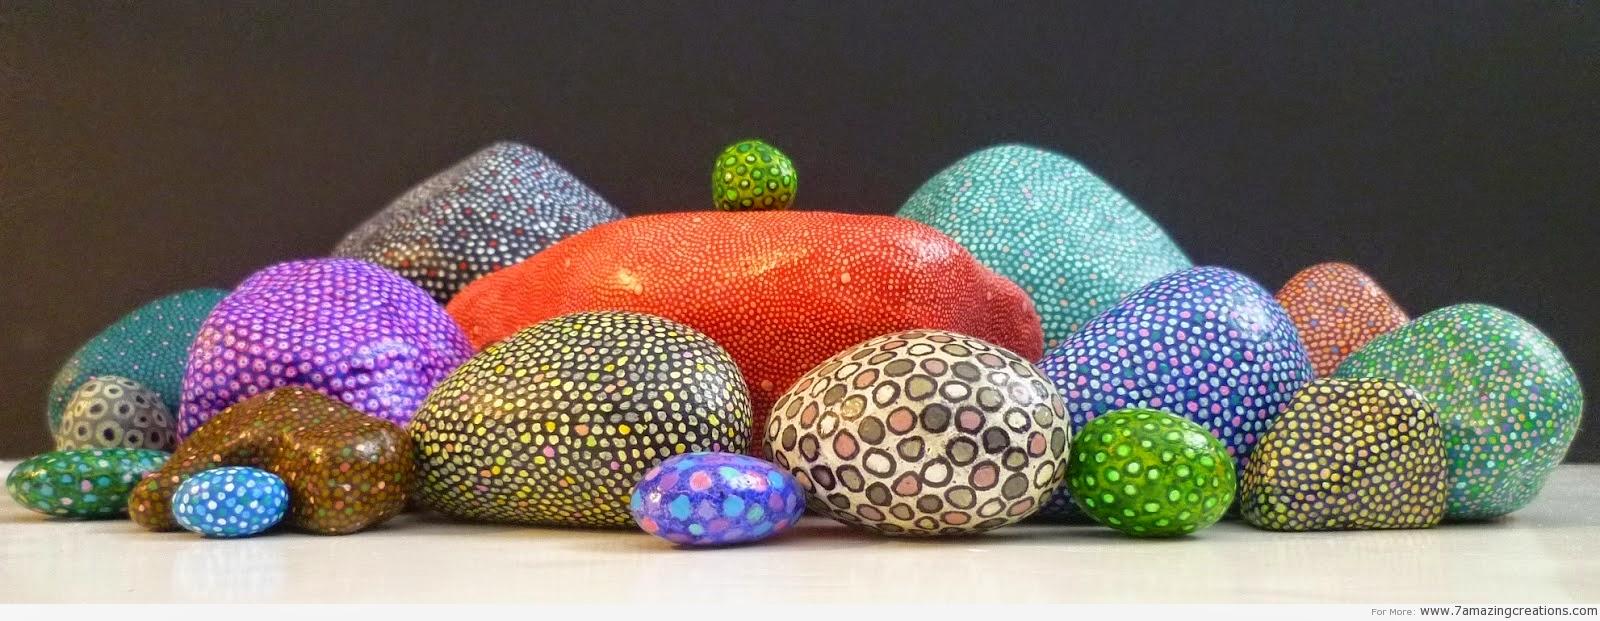 El arte de crear actividades de aula piedras pintadas for Tecnica para pintar piedras